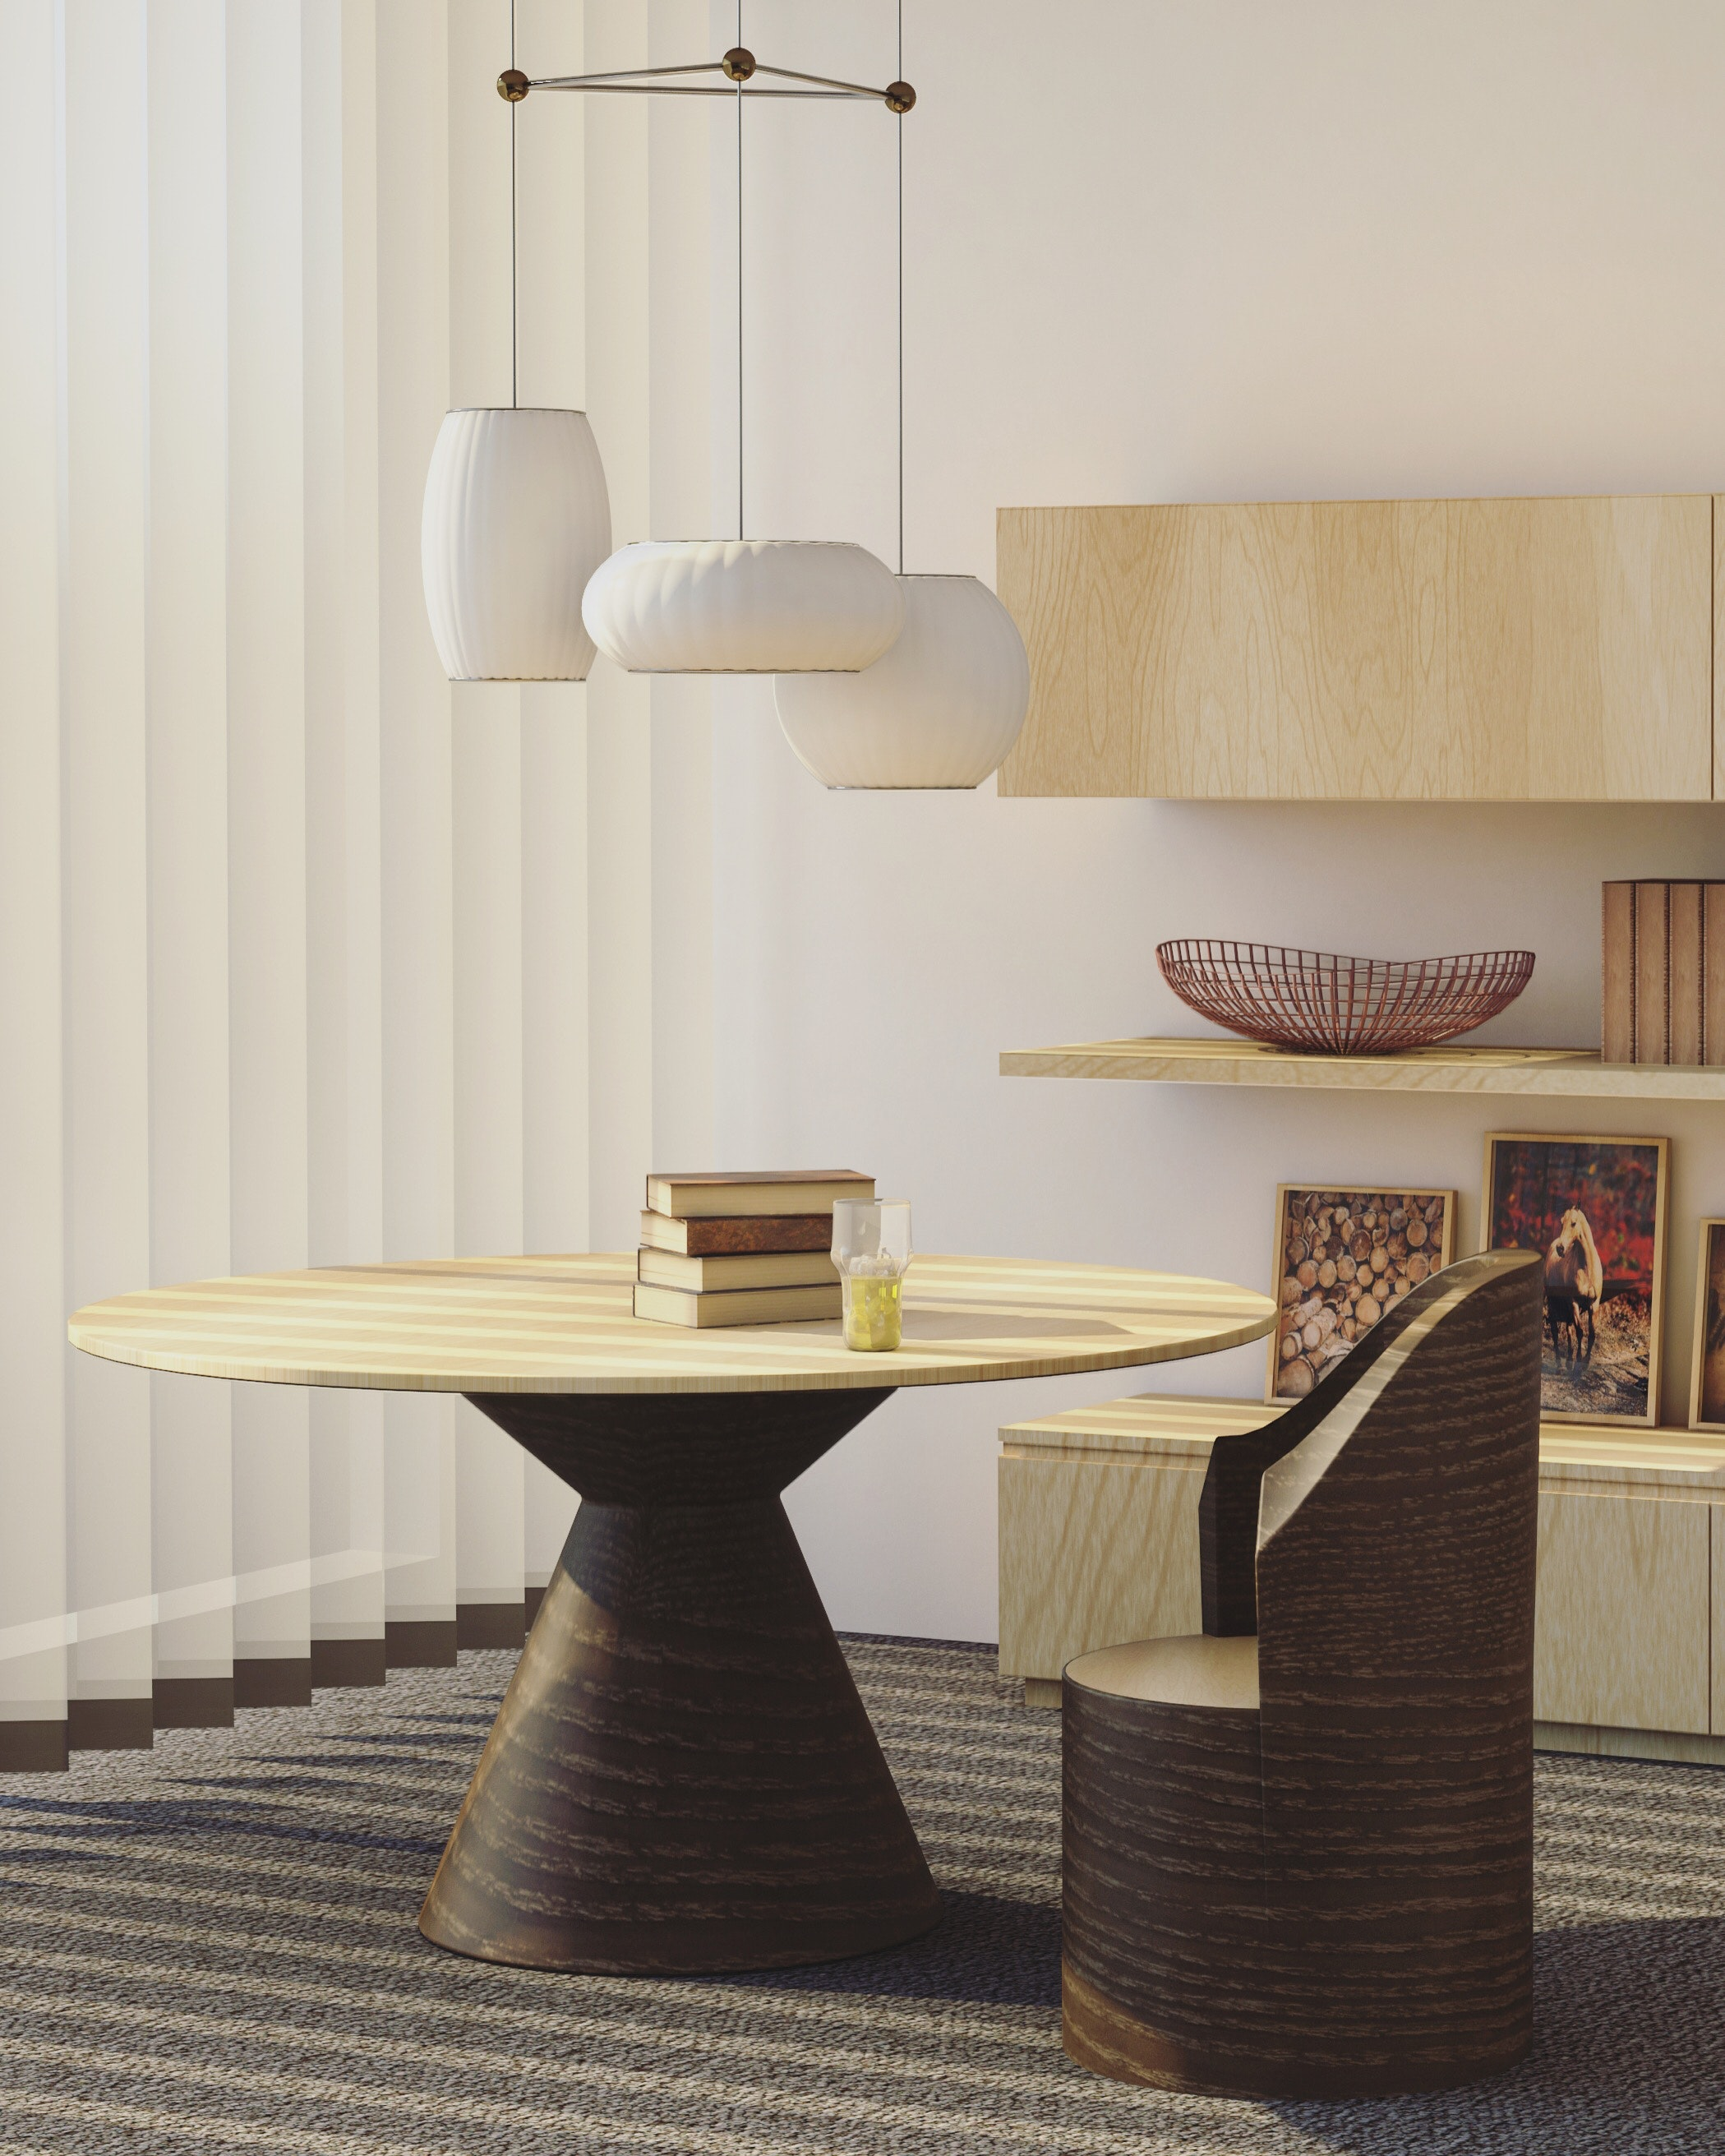 apartment-architecture-artist-447592.jpg